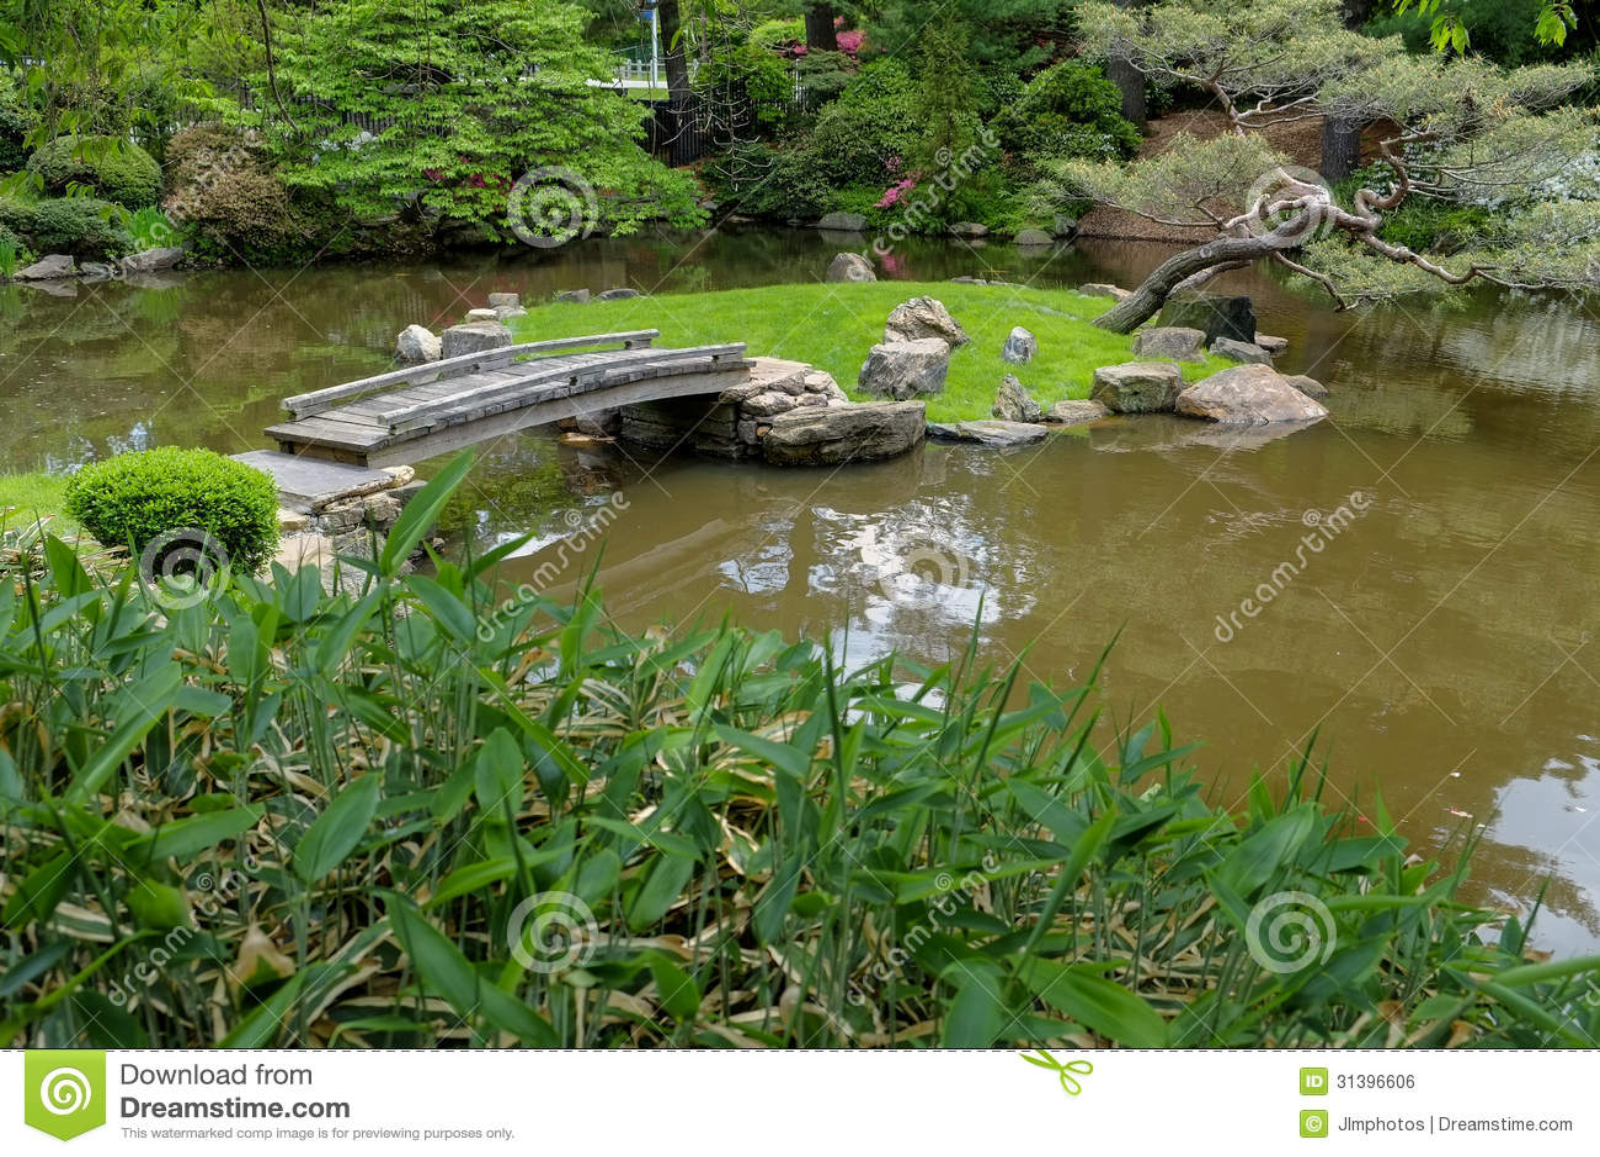 1000 Images About Zen Gardens On Pinterest Zen Gardens